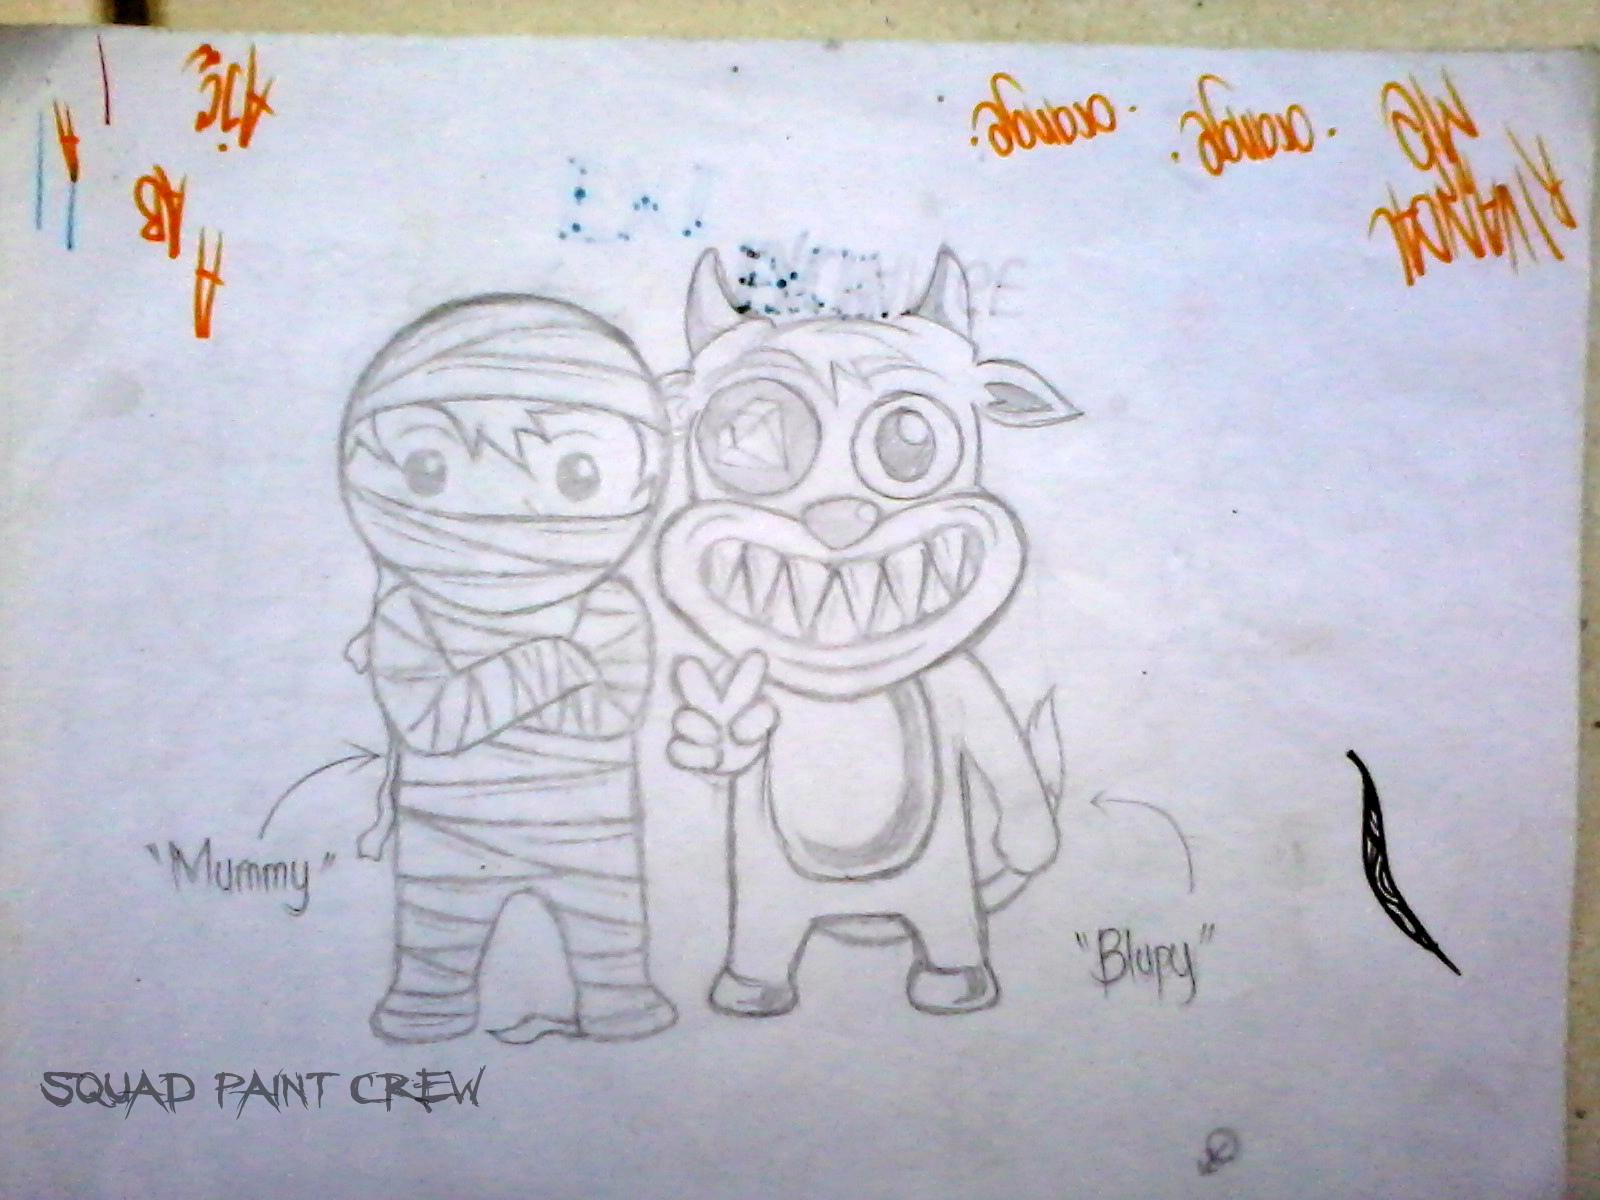 Squad paint crew sketsa